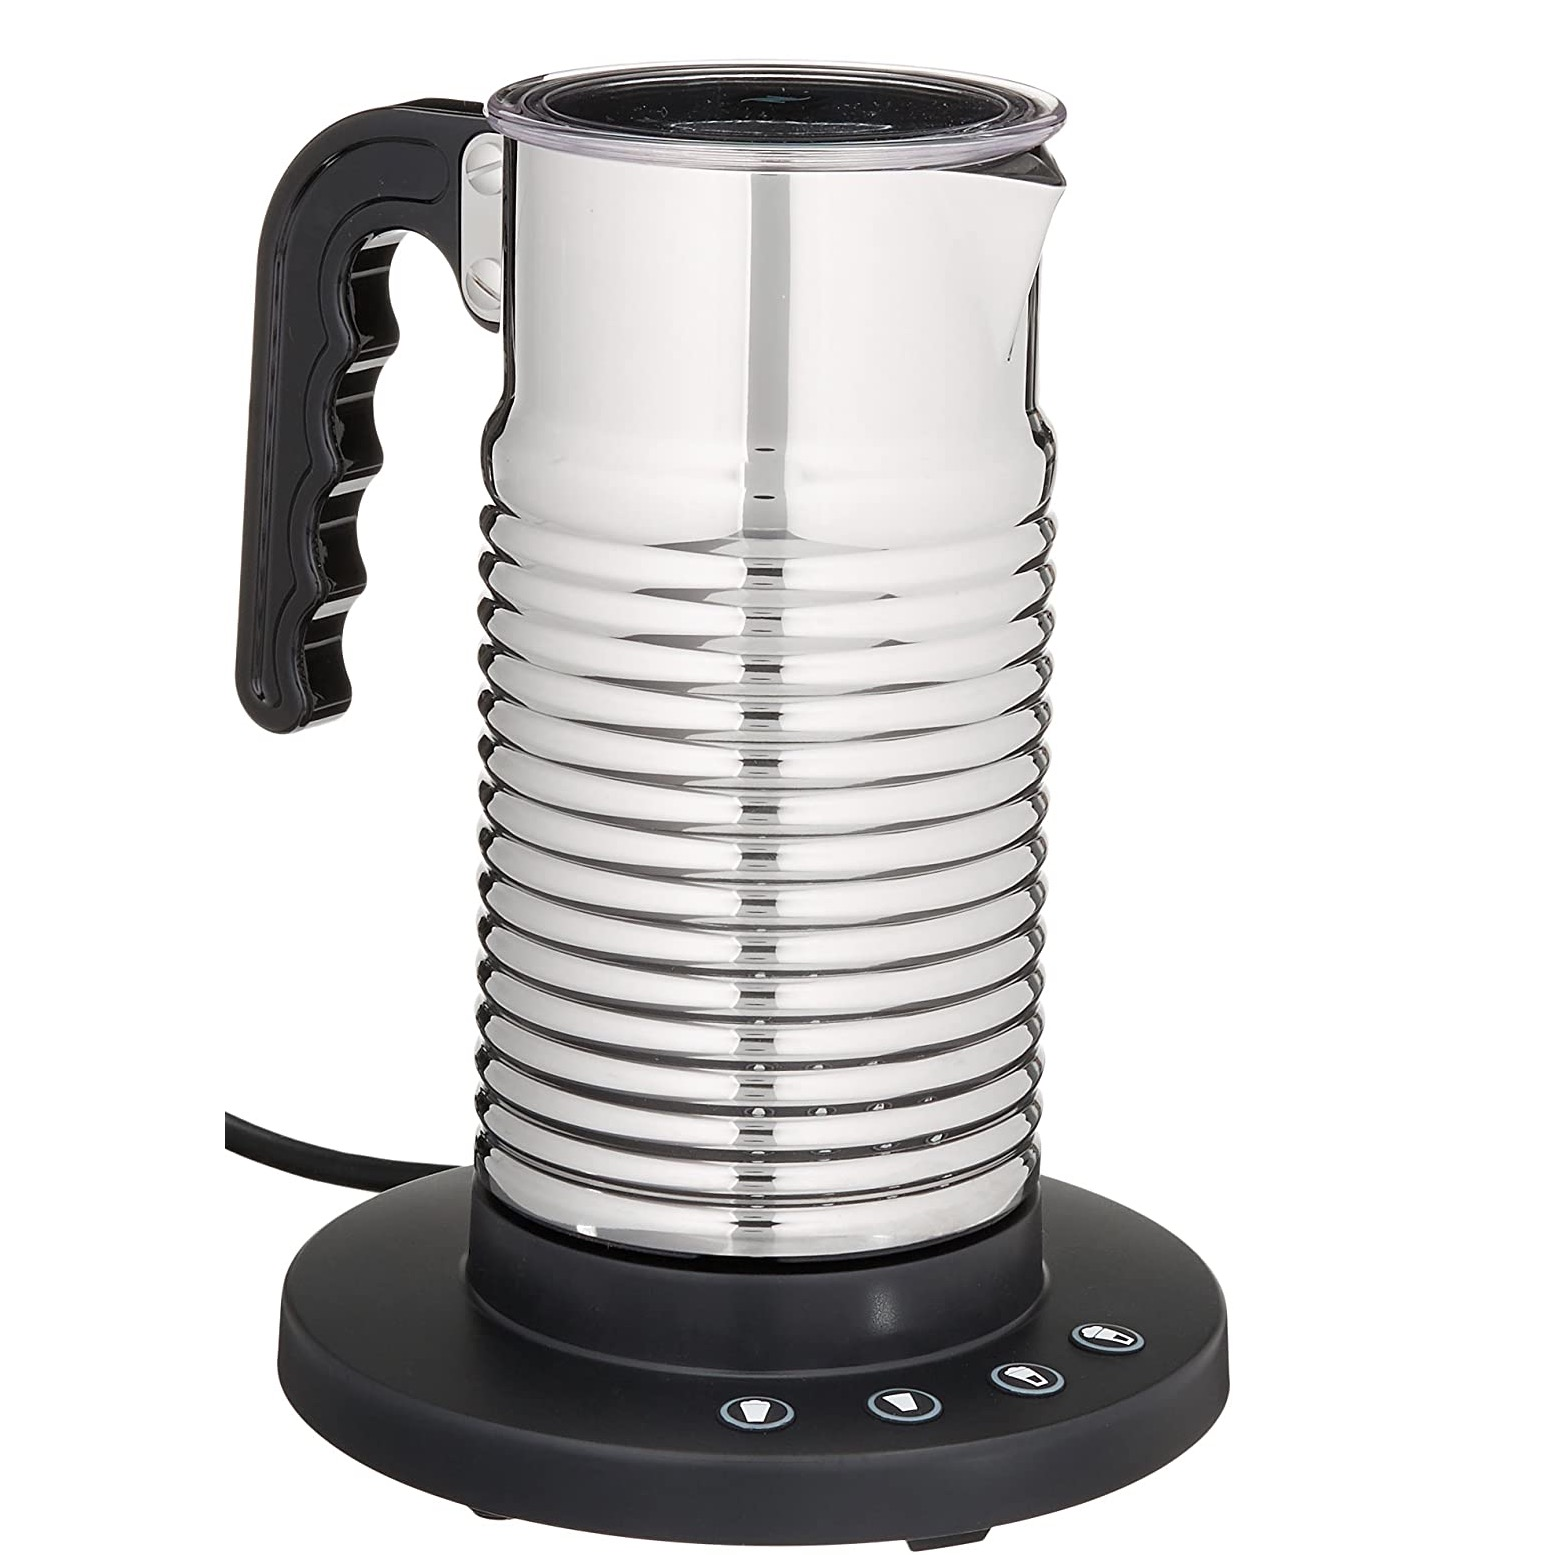 Nespresso Aeroccino 4 Milk Frother review